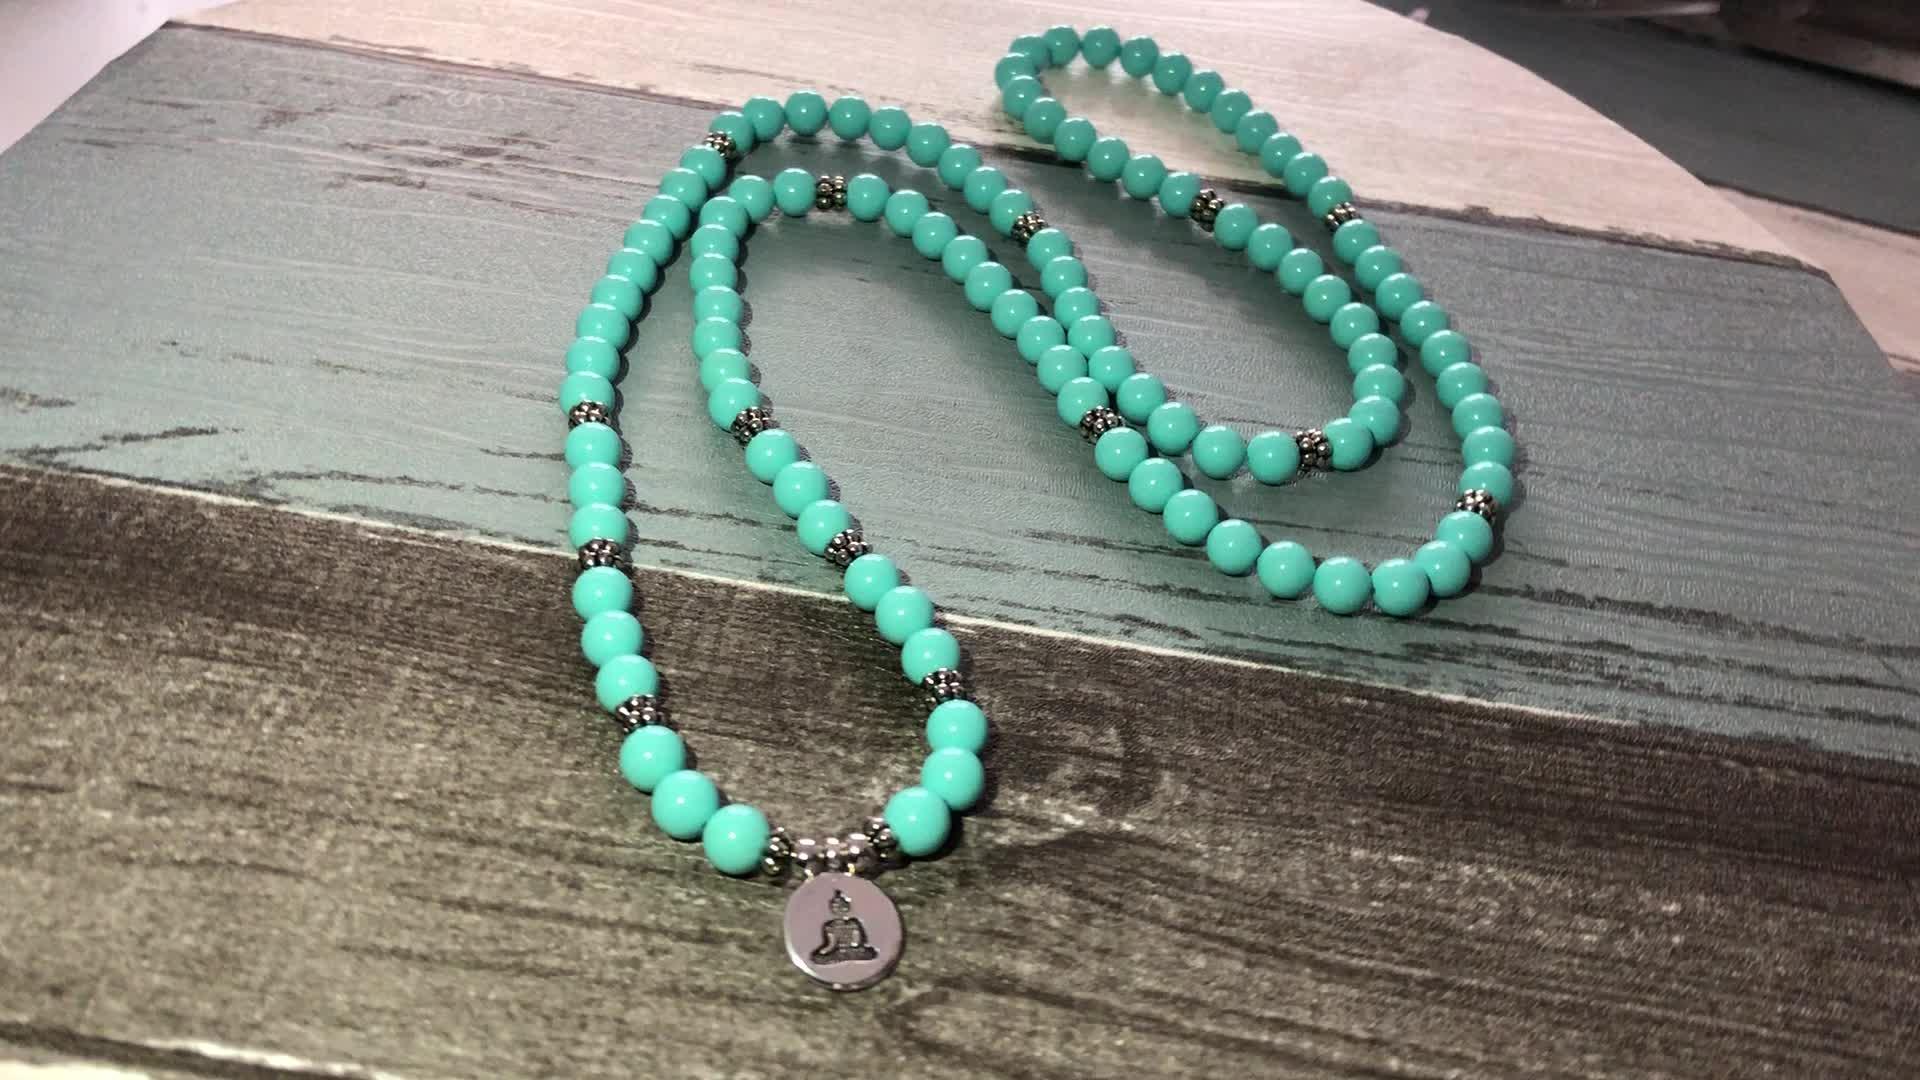 SN1310 108 Prayer beads Mala Bracelet For Men Germany Turquoise Stone Wrapped Wrist OM Buddhist Buddha Charm Bracelet